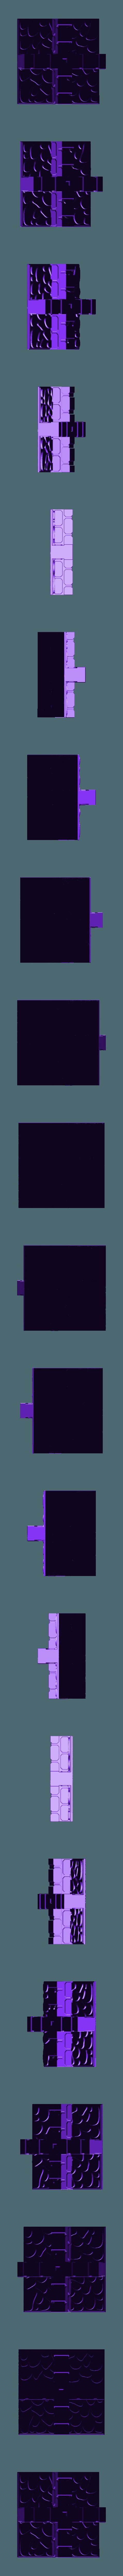 Finalized_Wall_X.stl Download STL file GeneriTiles - Tabletop RPG Tileset • 3D printable object, daandruff